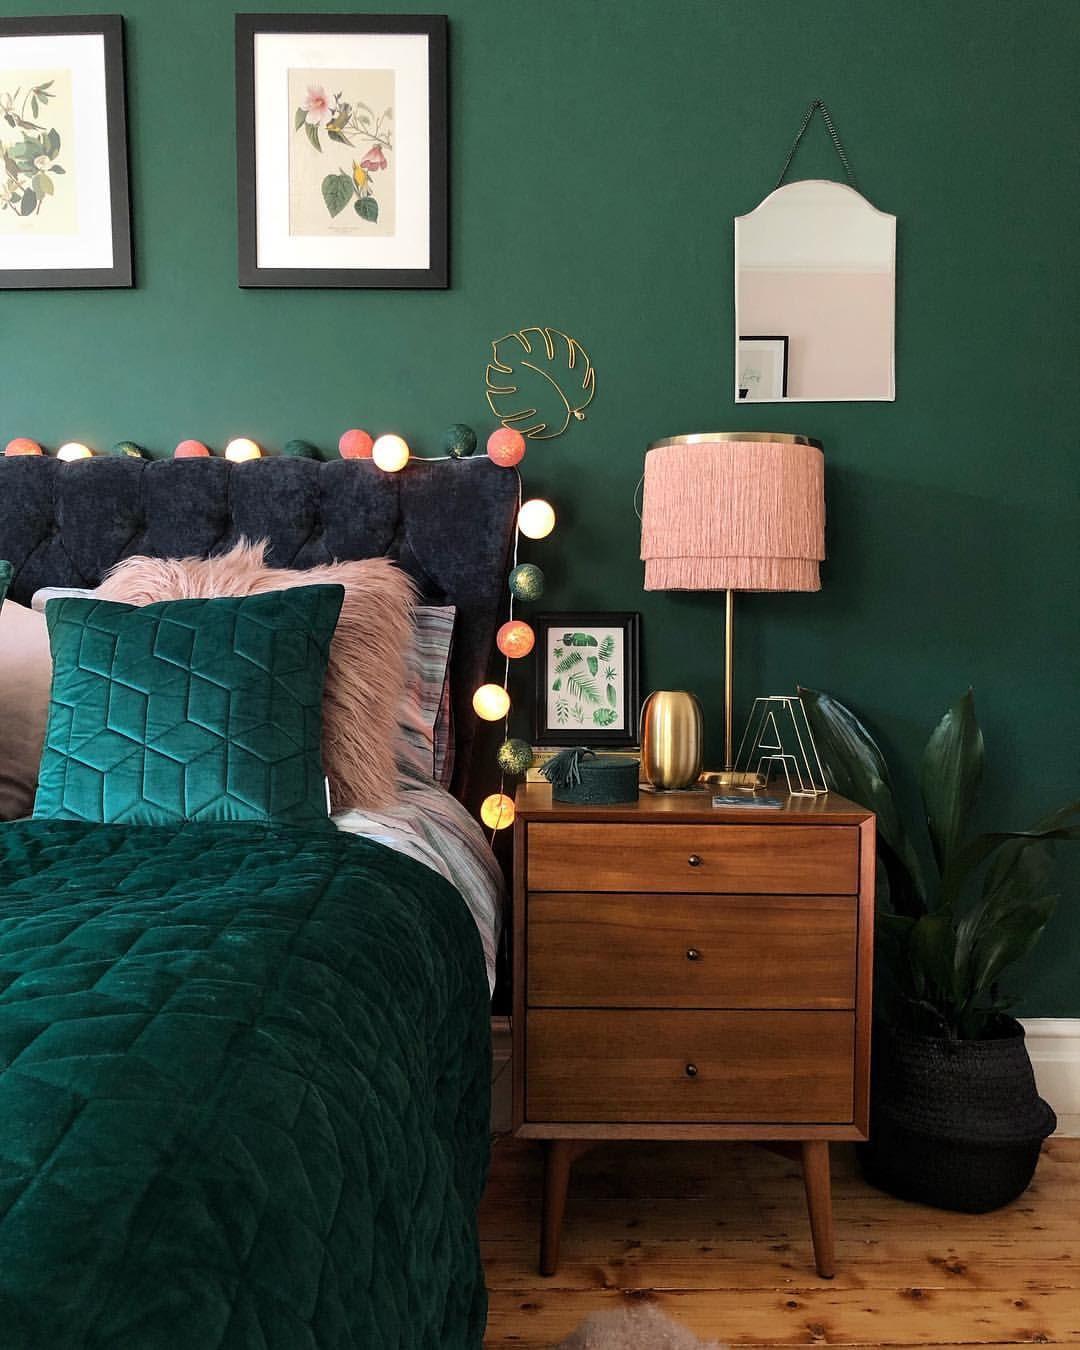 Dark Green And Blush Pink Bedroom With Mid Century Furniture And Velvet Bedding Darkgreen Greendecor Pinkandgreen Bedroomdecor With Images Bedroom Green Bedroom Design